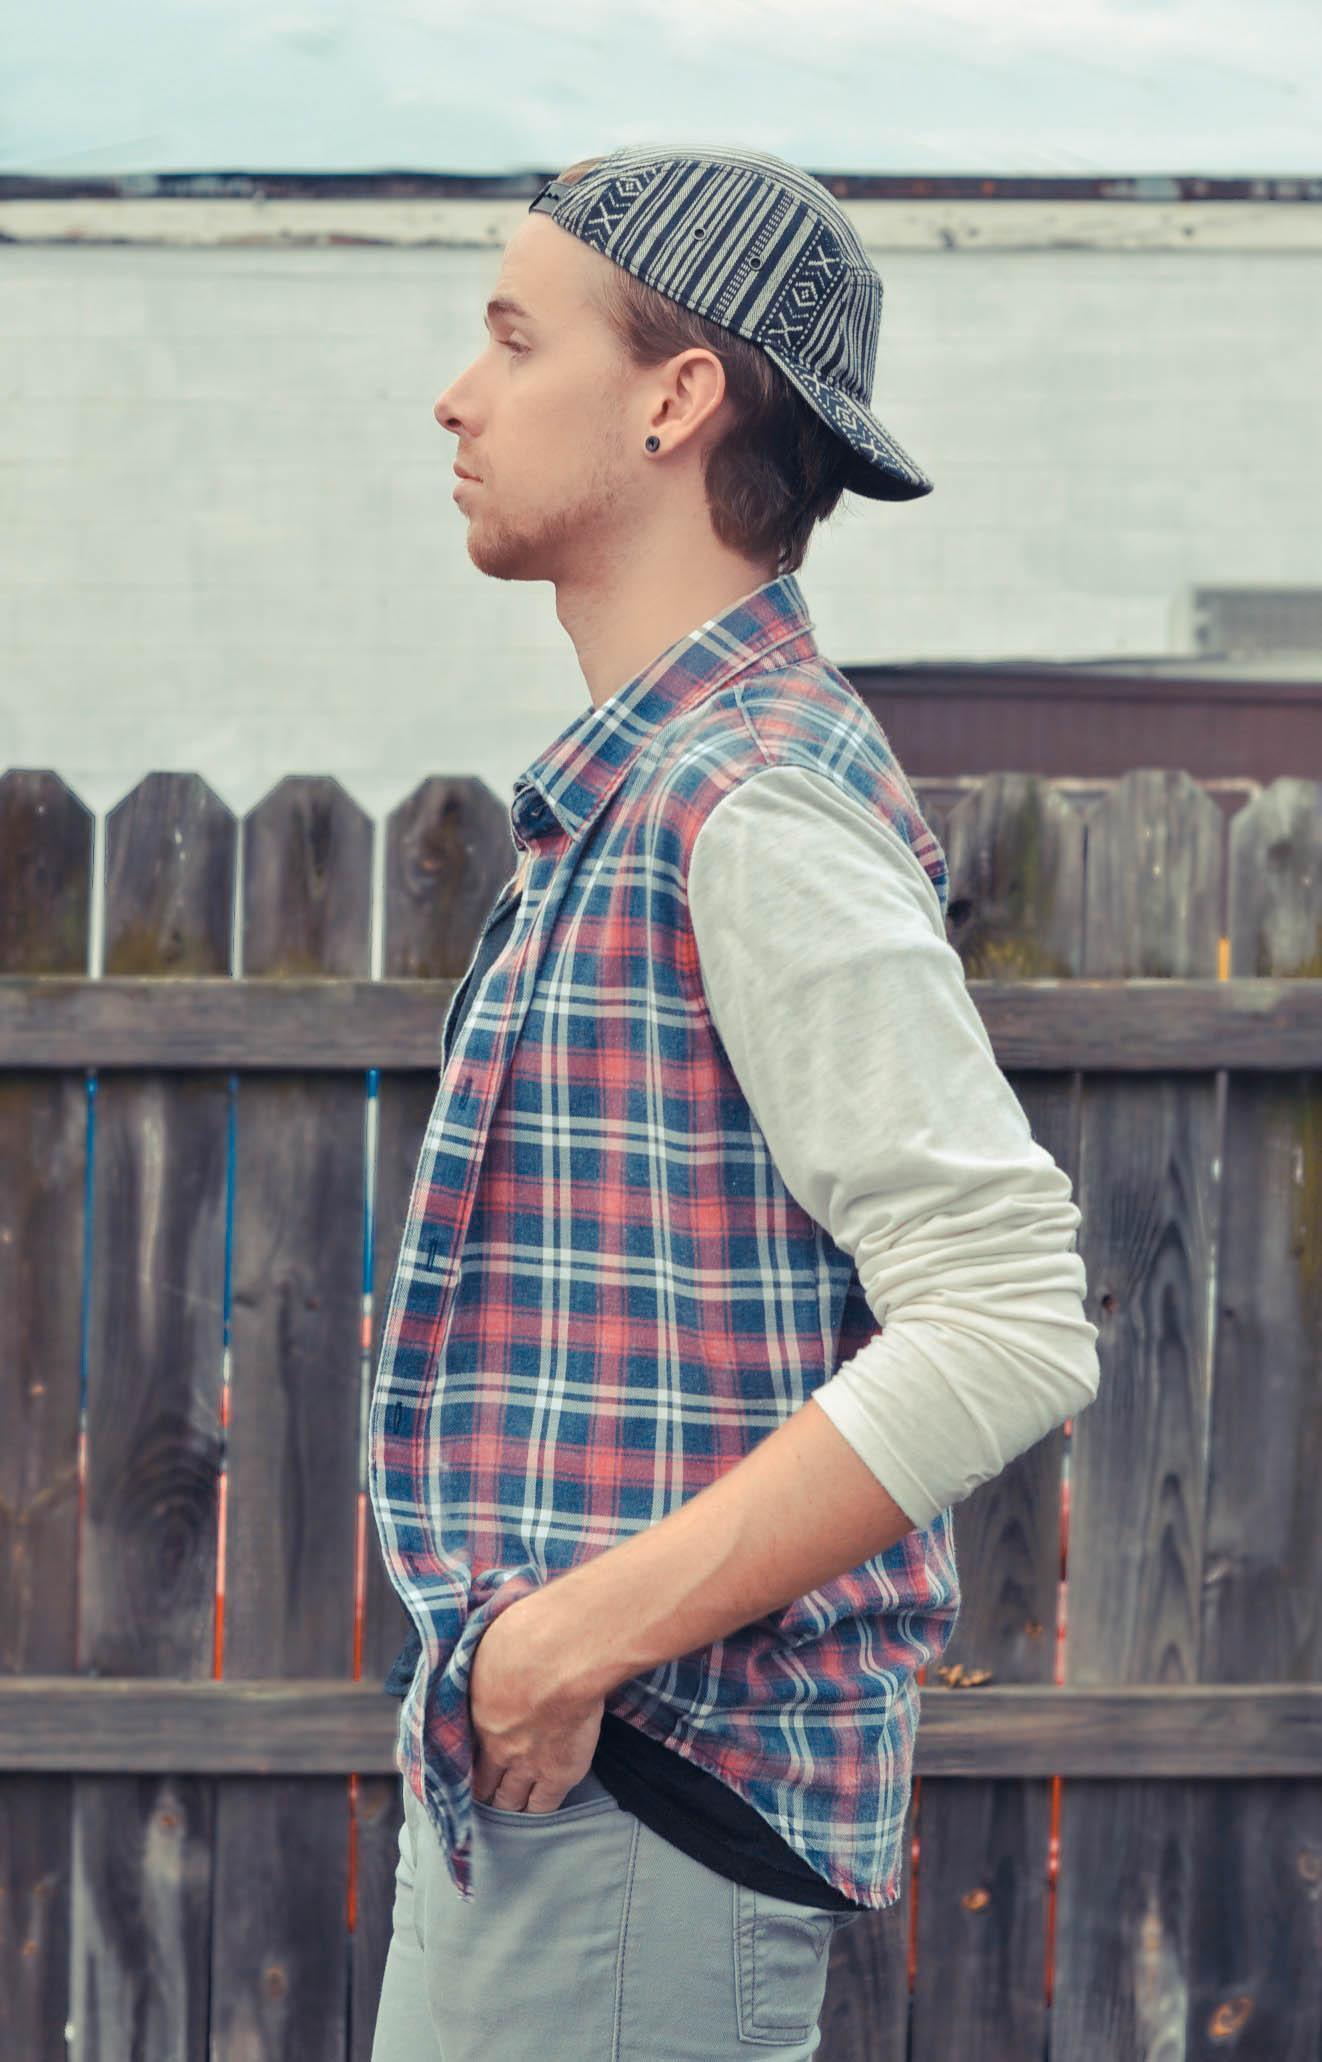 aztec-print-hat-forever-21-american-apparel-v-neck-t-shirt-color-fast-plaid-shirt-levis-jeans